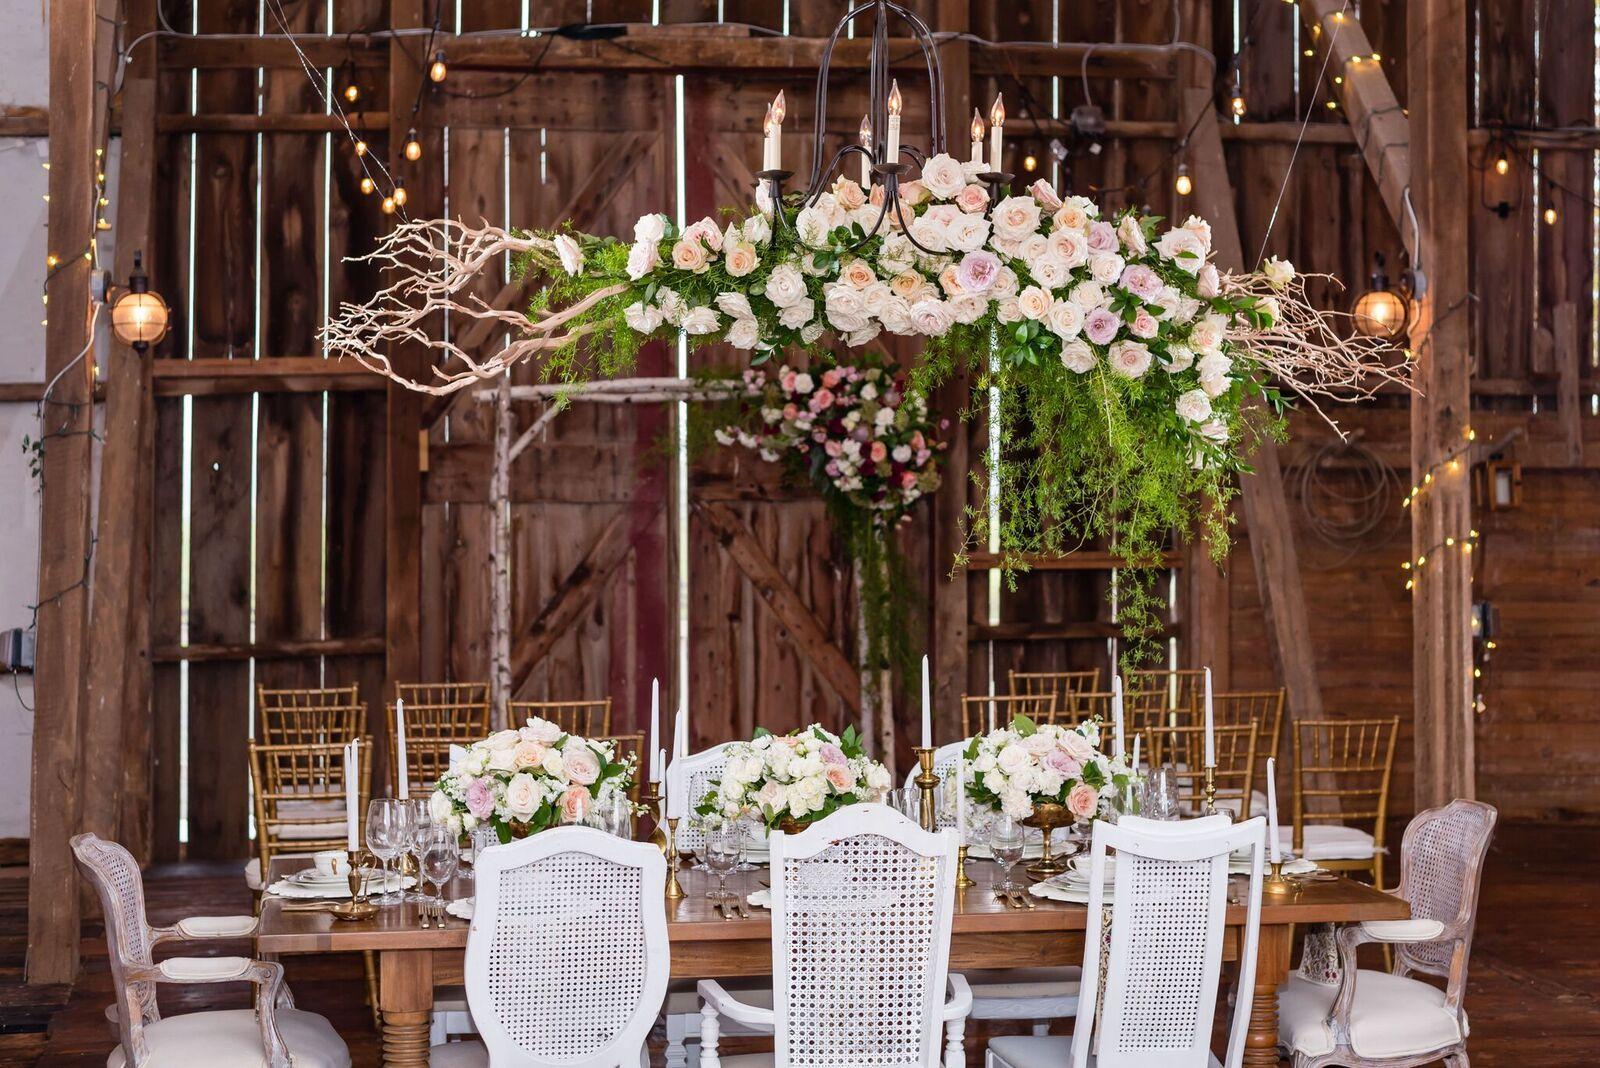 Barn Wedding Rustic Chic Table Setting Vintage Hanging Flowers